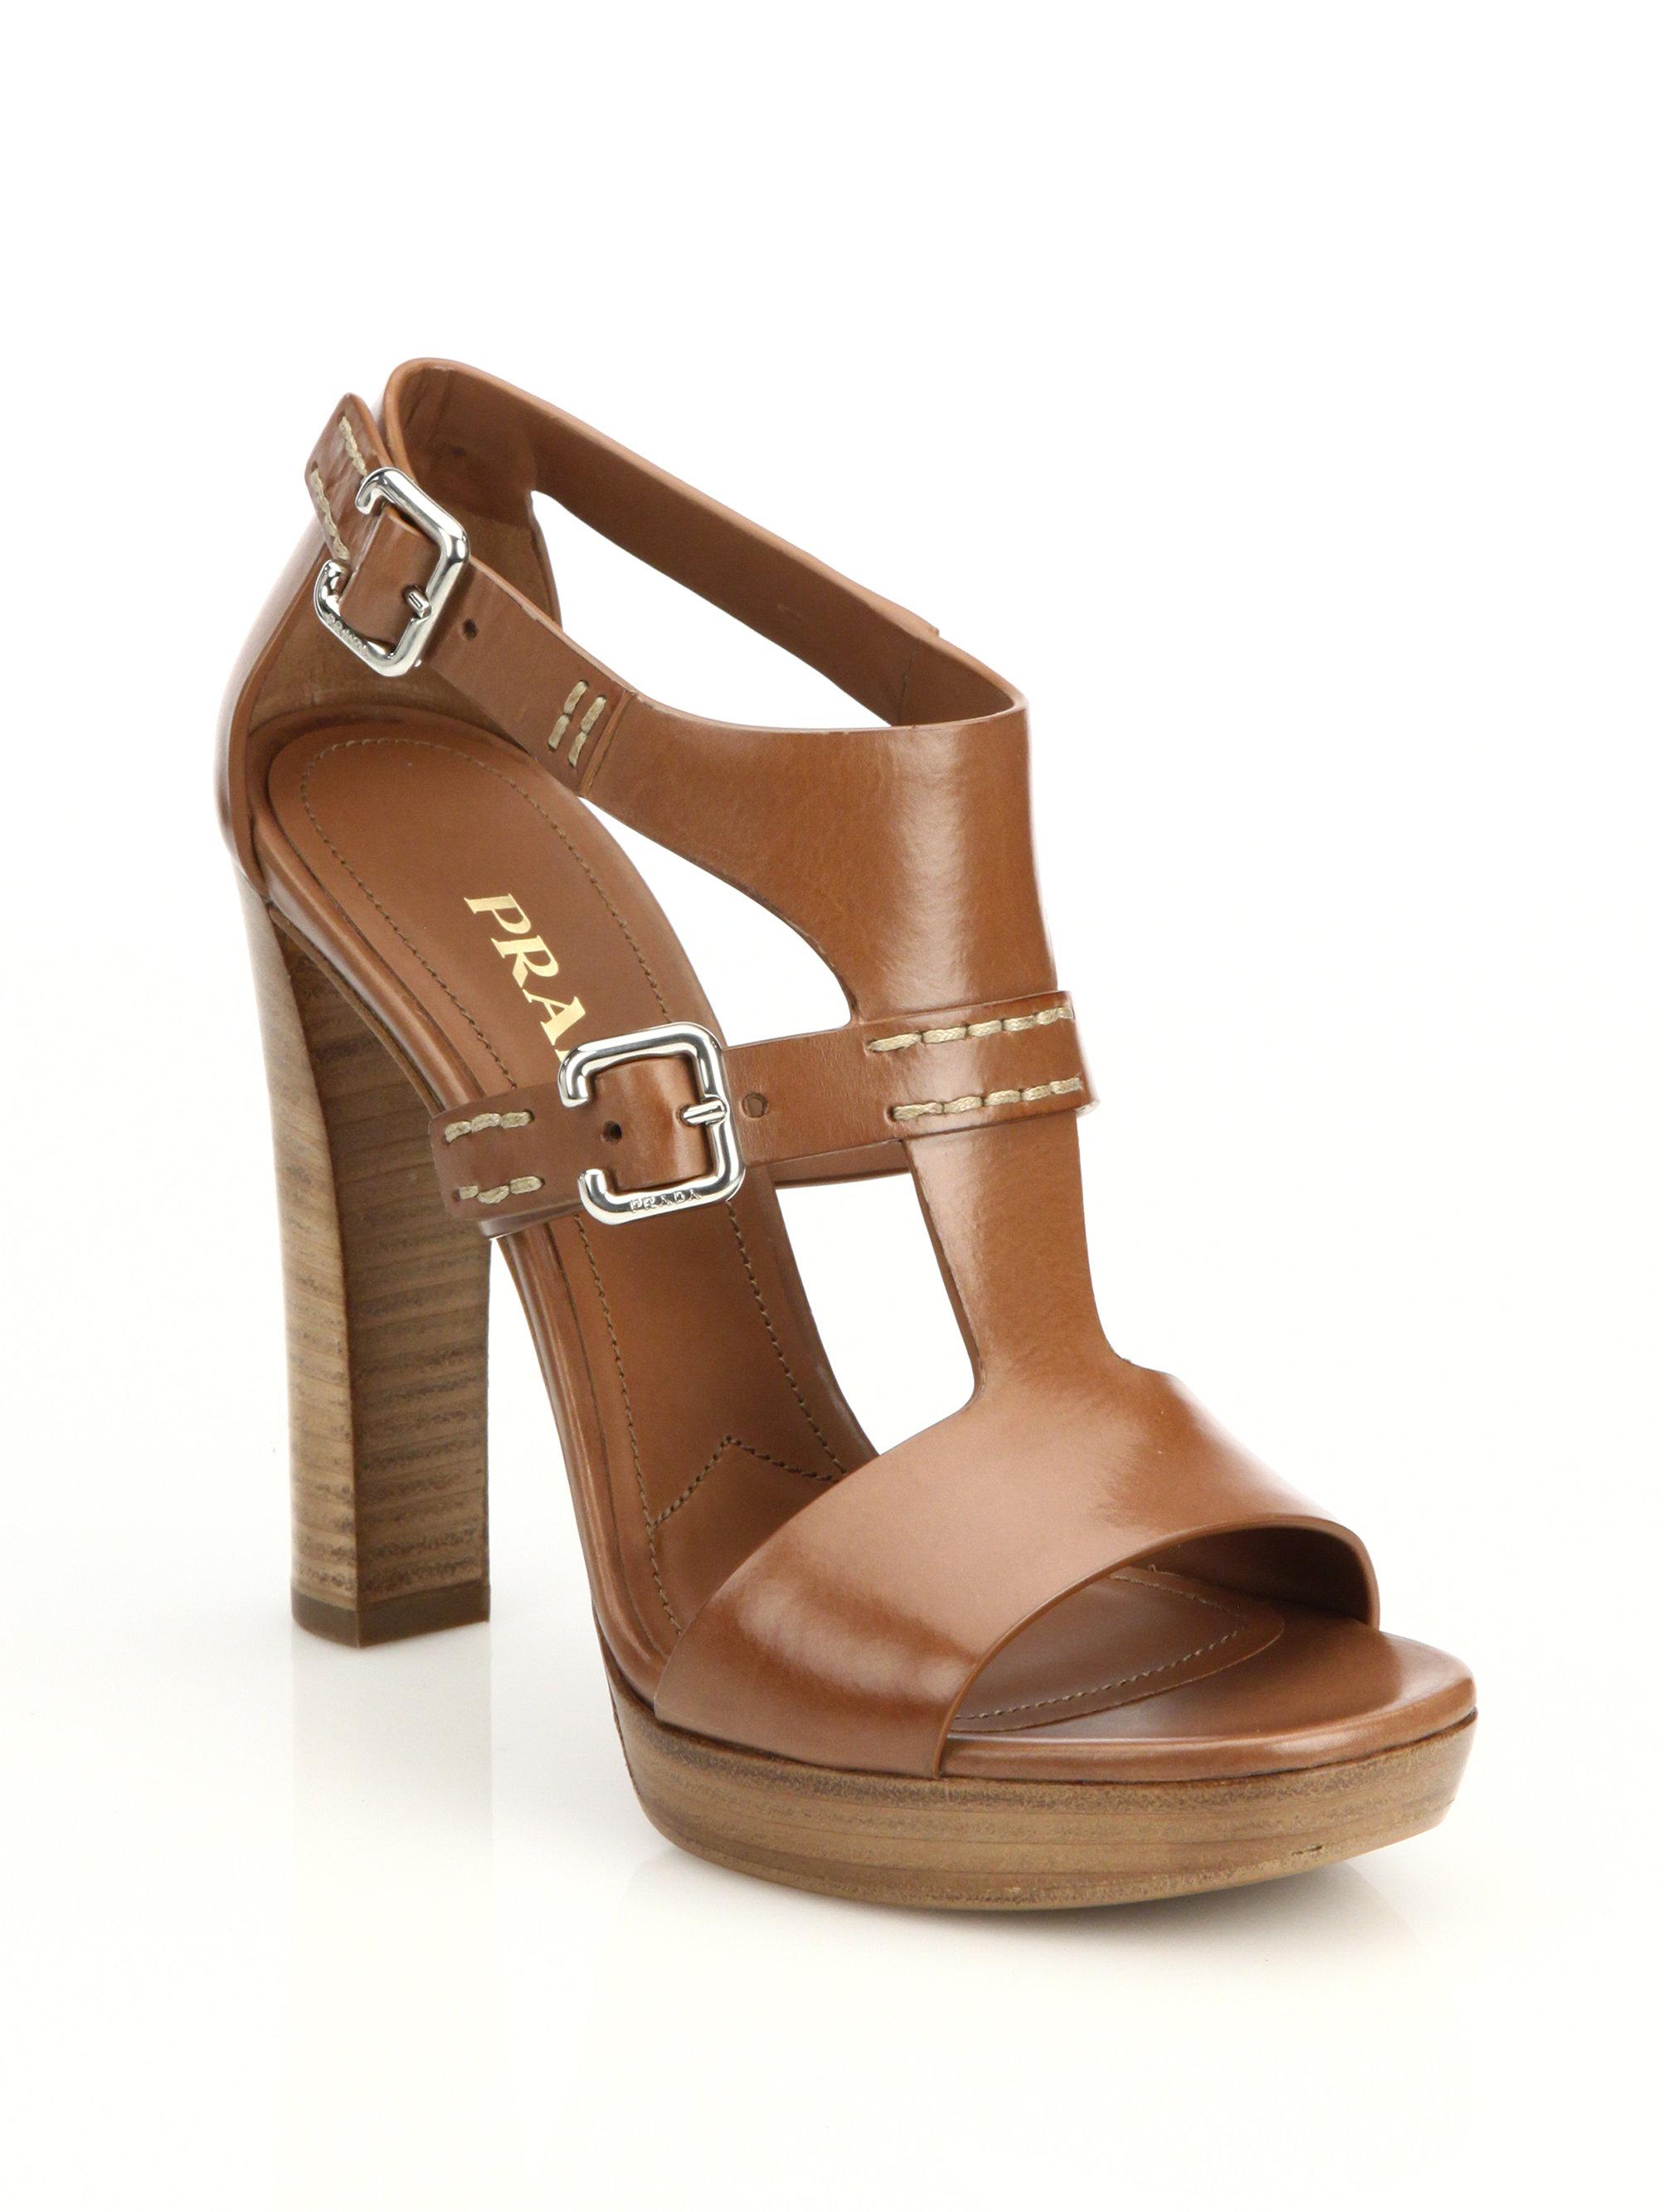 lyst prada leather stackedheel sandals in brown